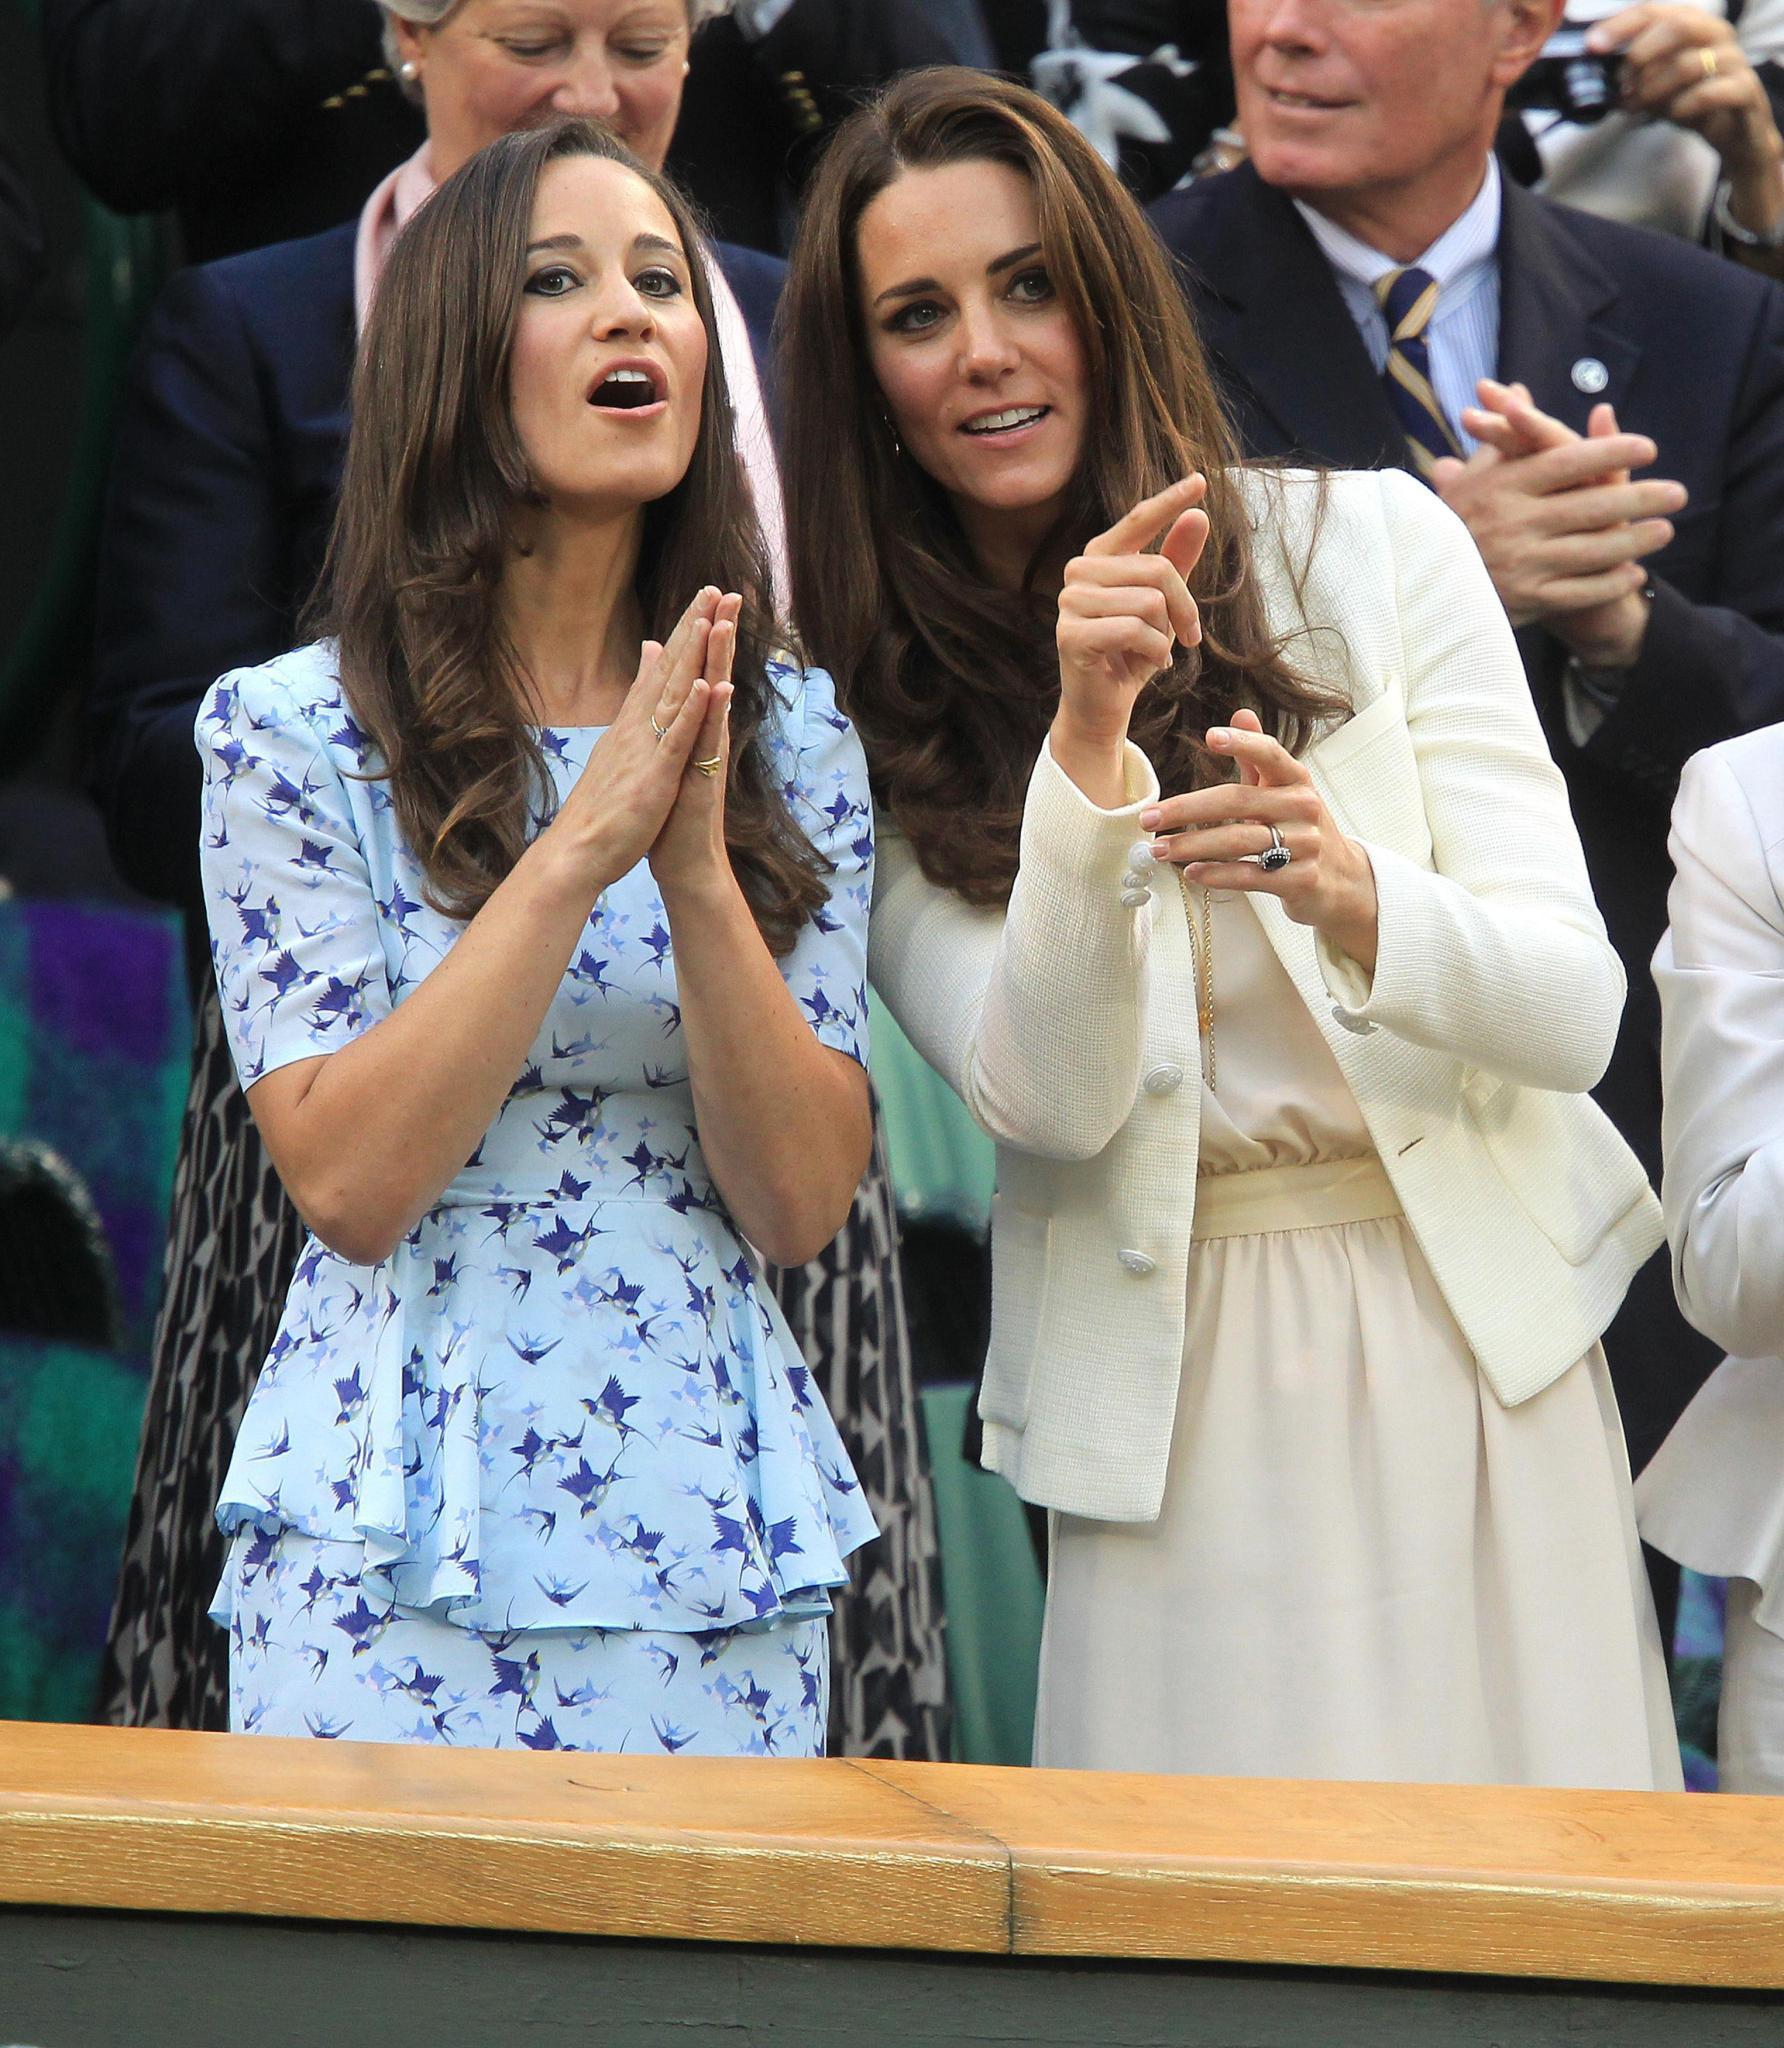 Pippa Middleton, Herzogin Catherine